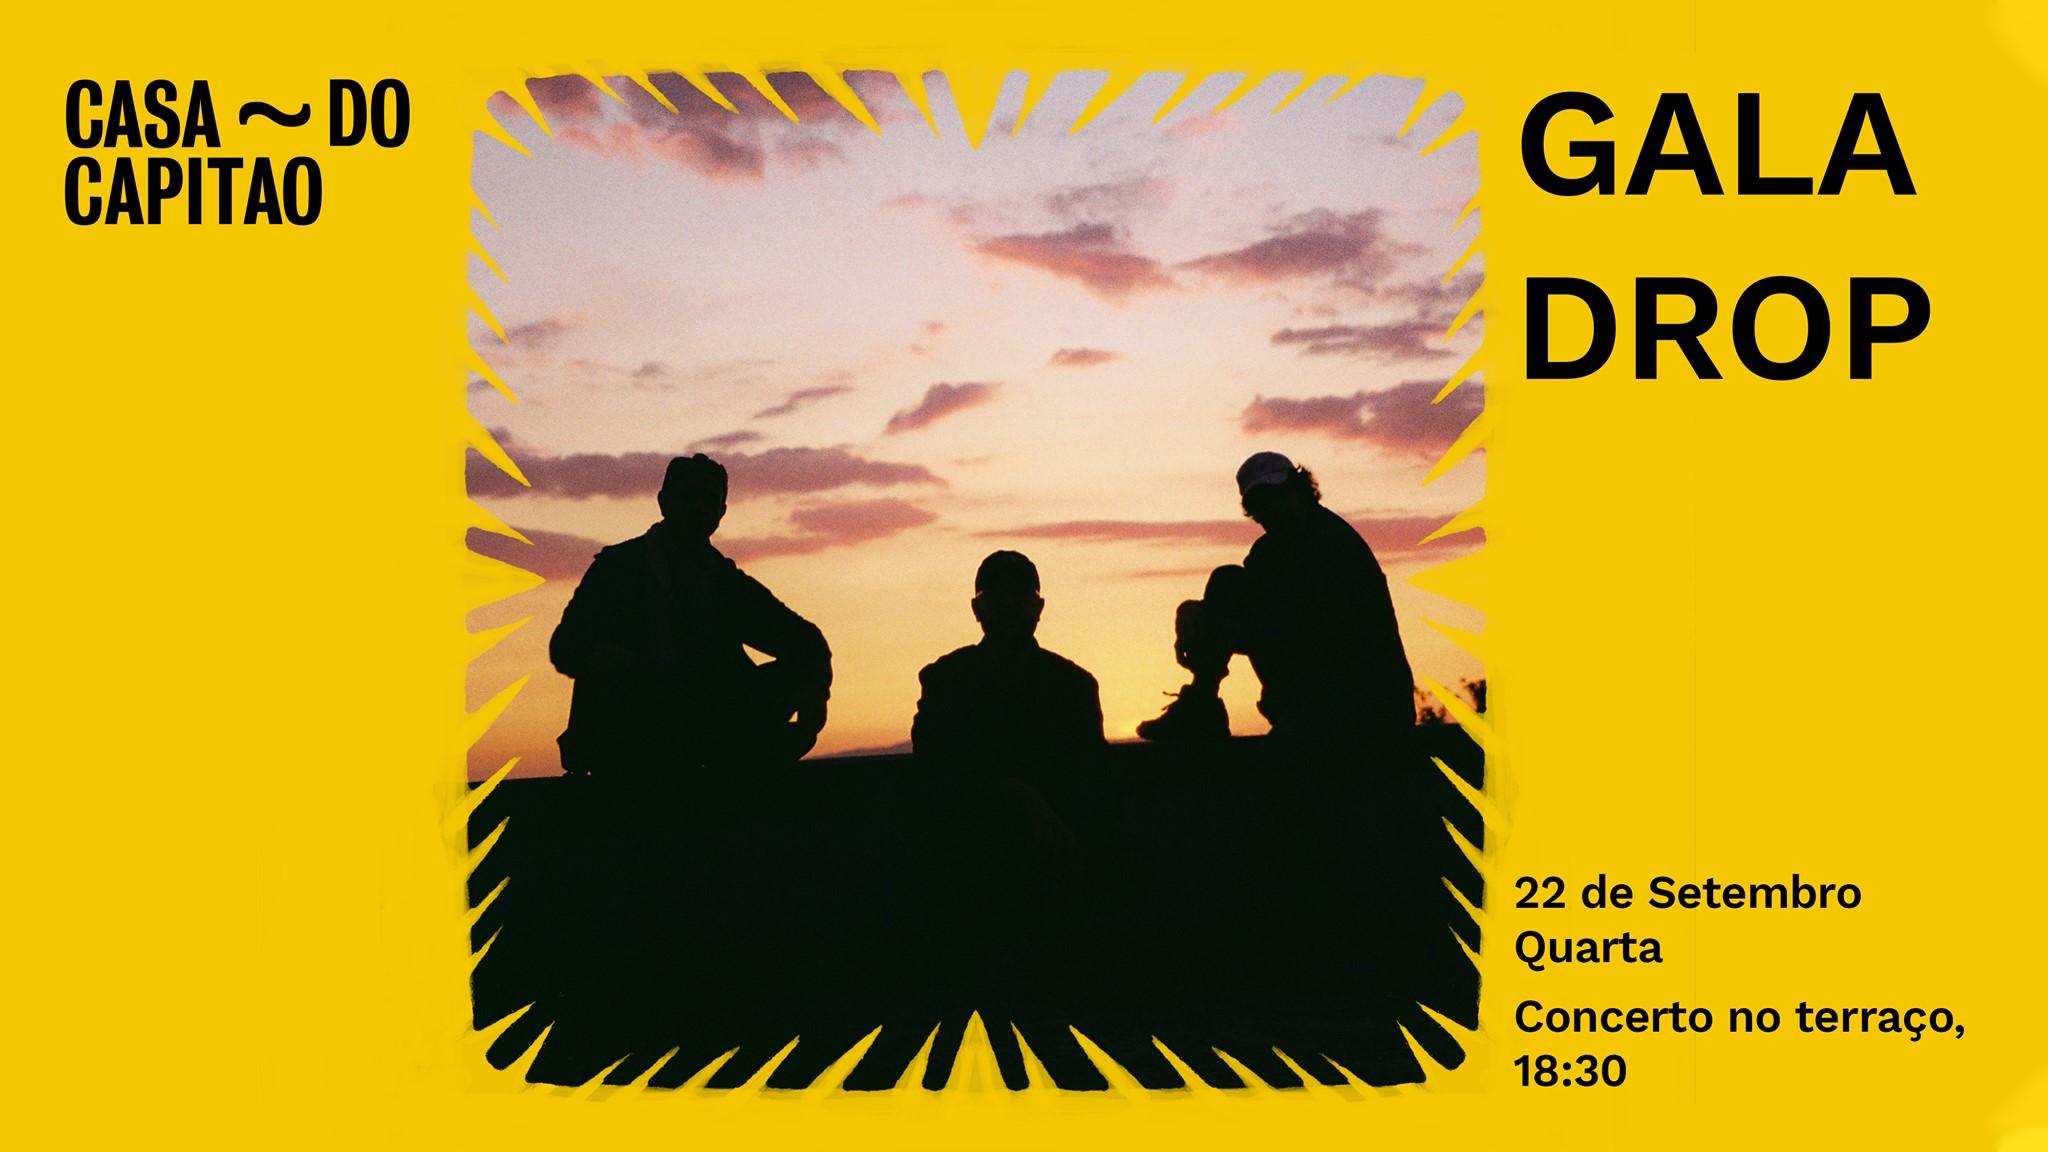 Gala Drop • concerto no terraço